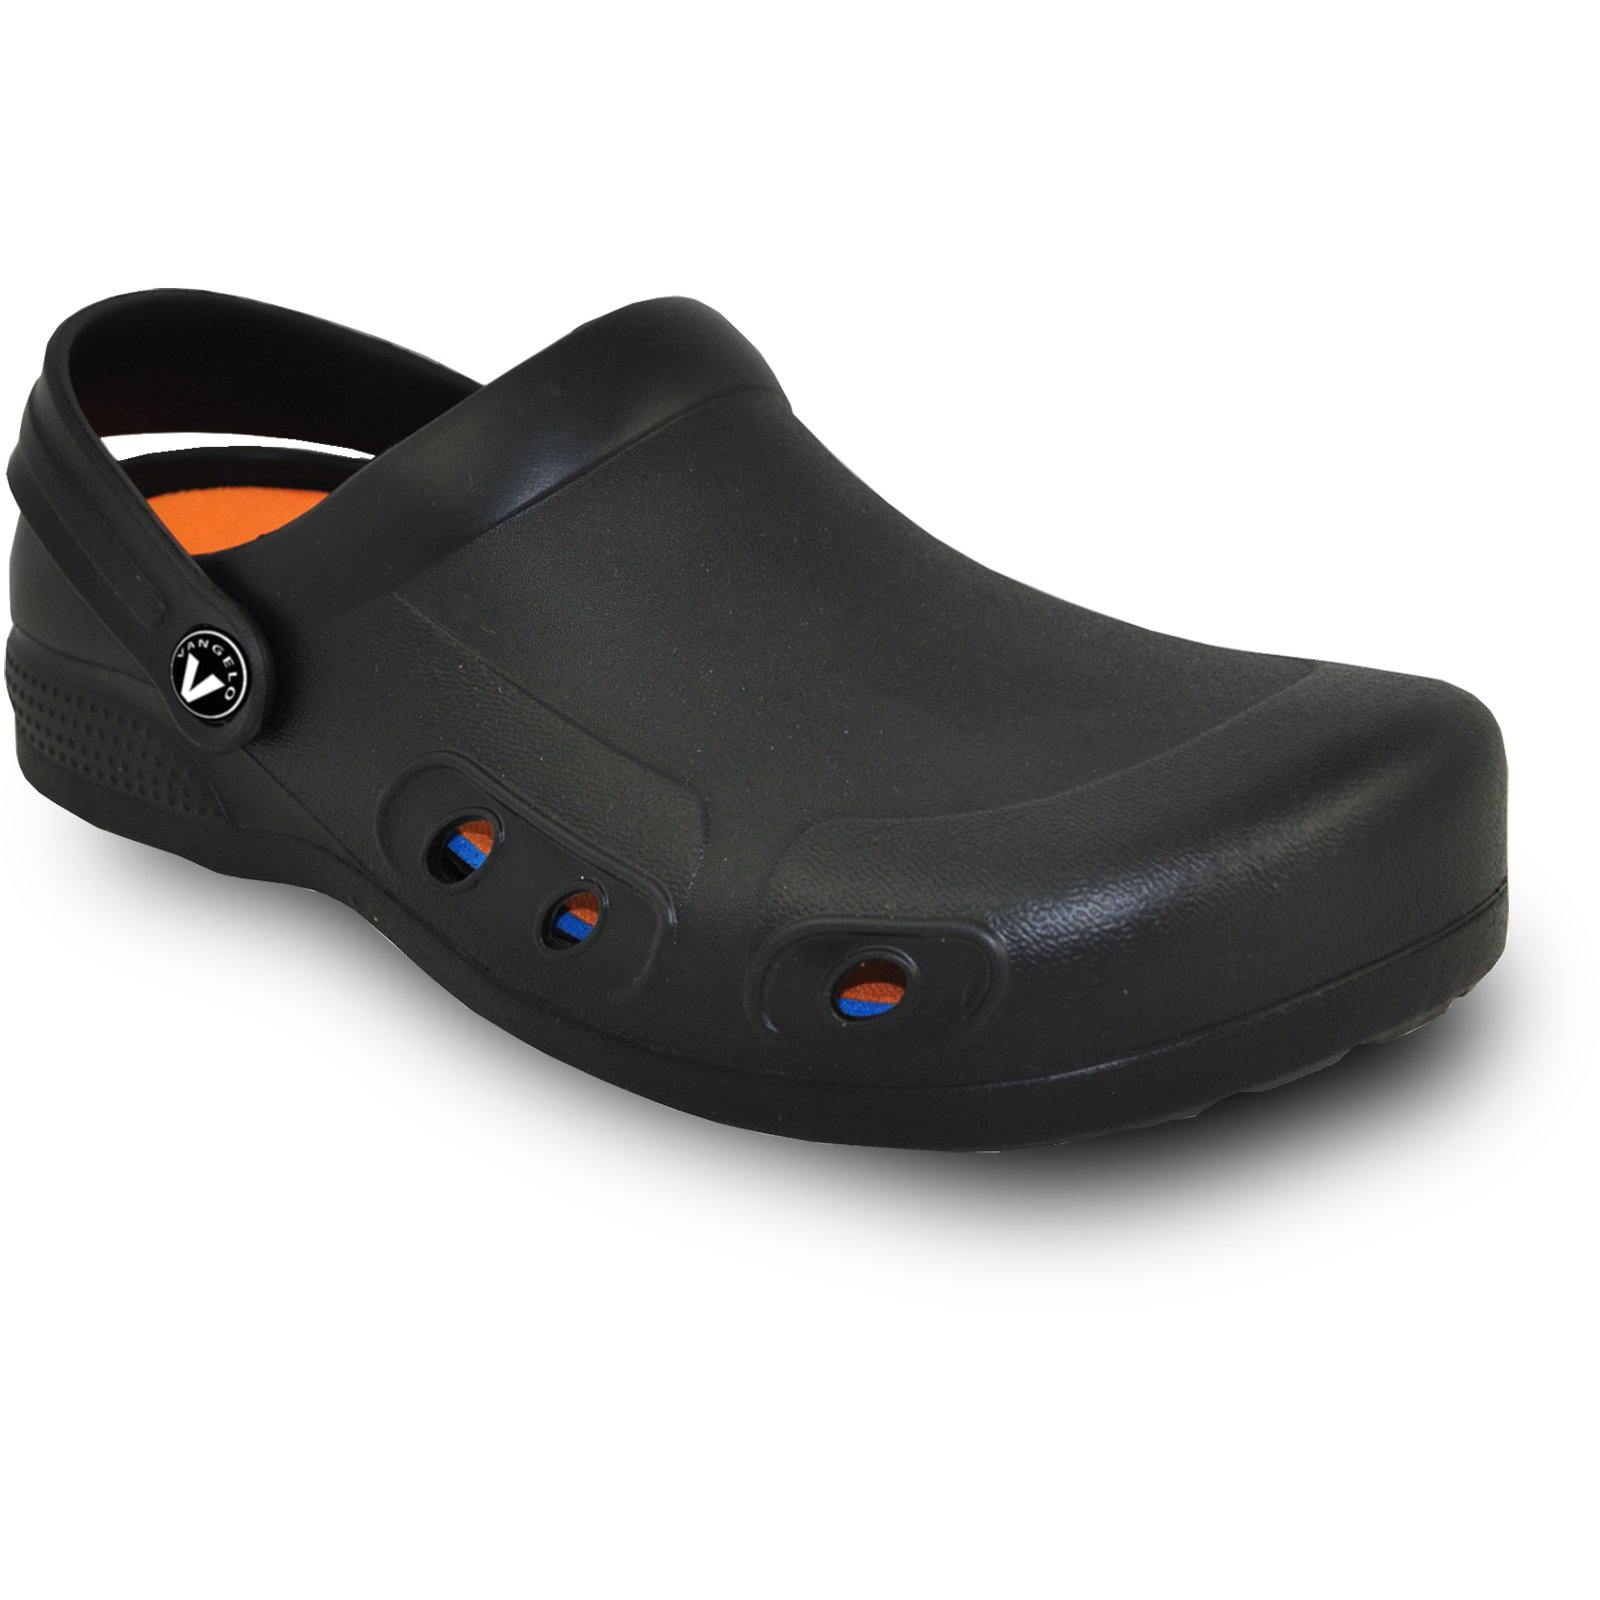 VANGELO Professional Slip Resistant Clog Unisex Work Shoe Ritz Black